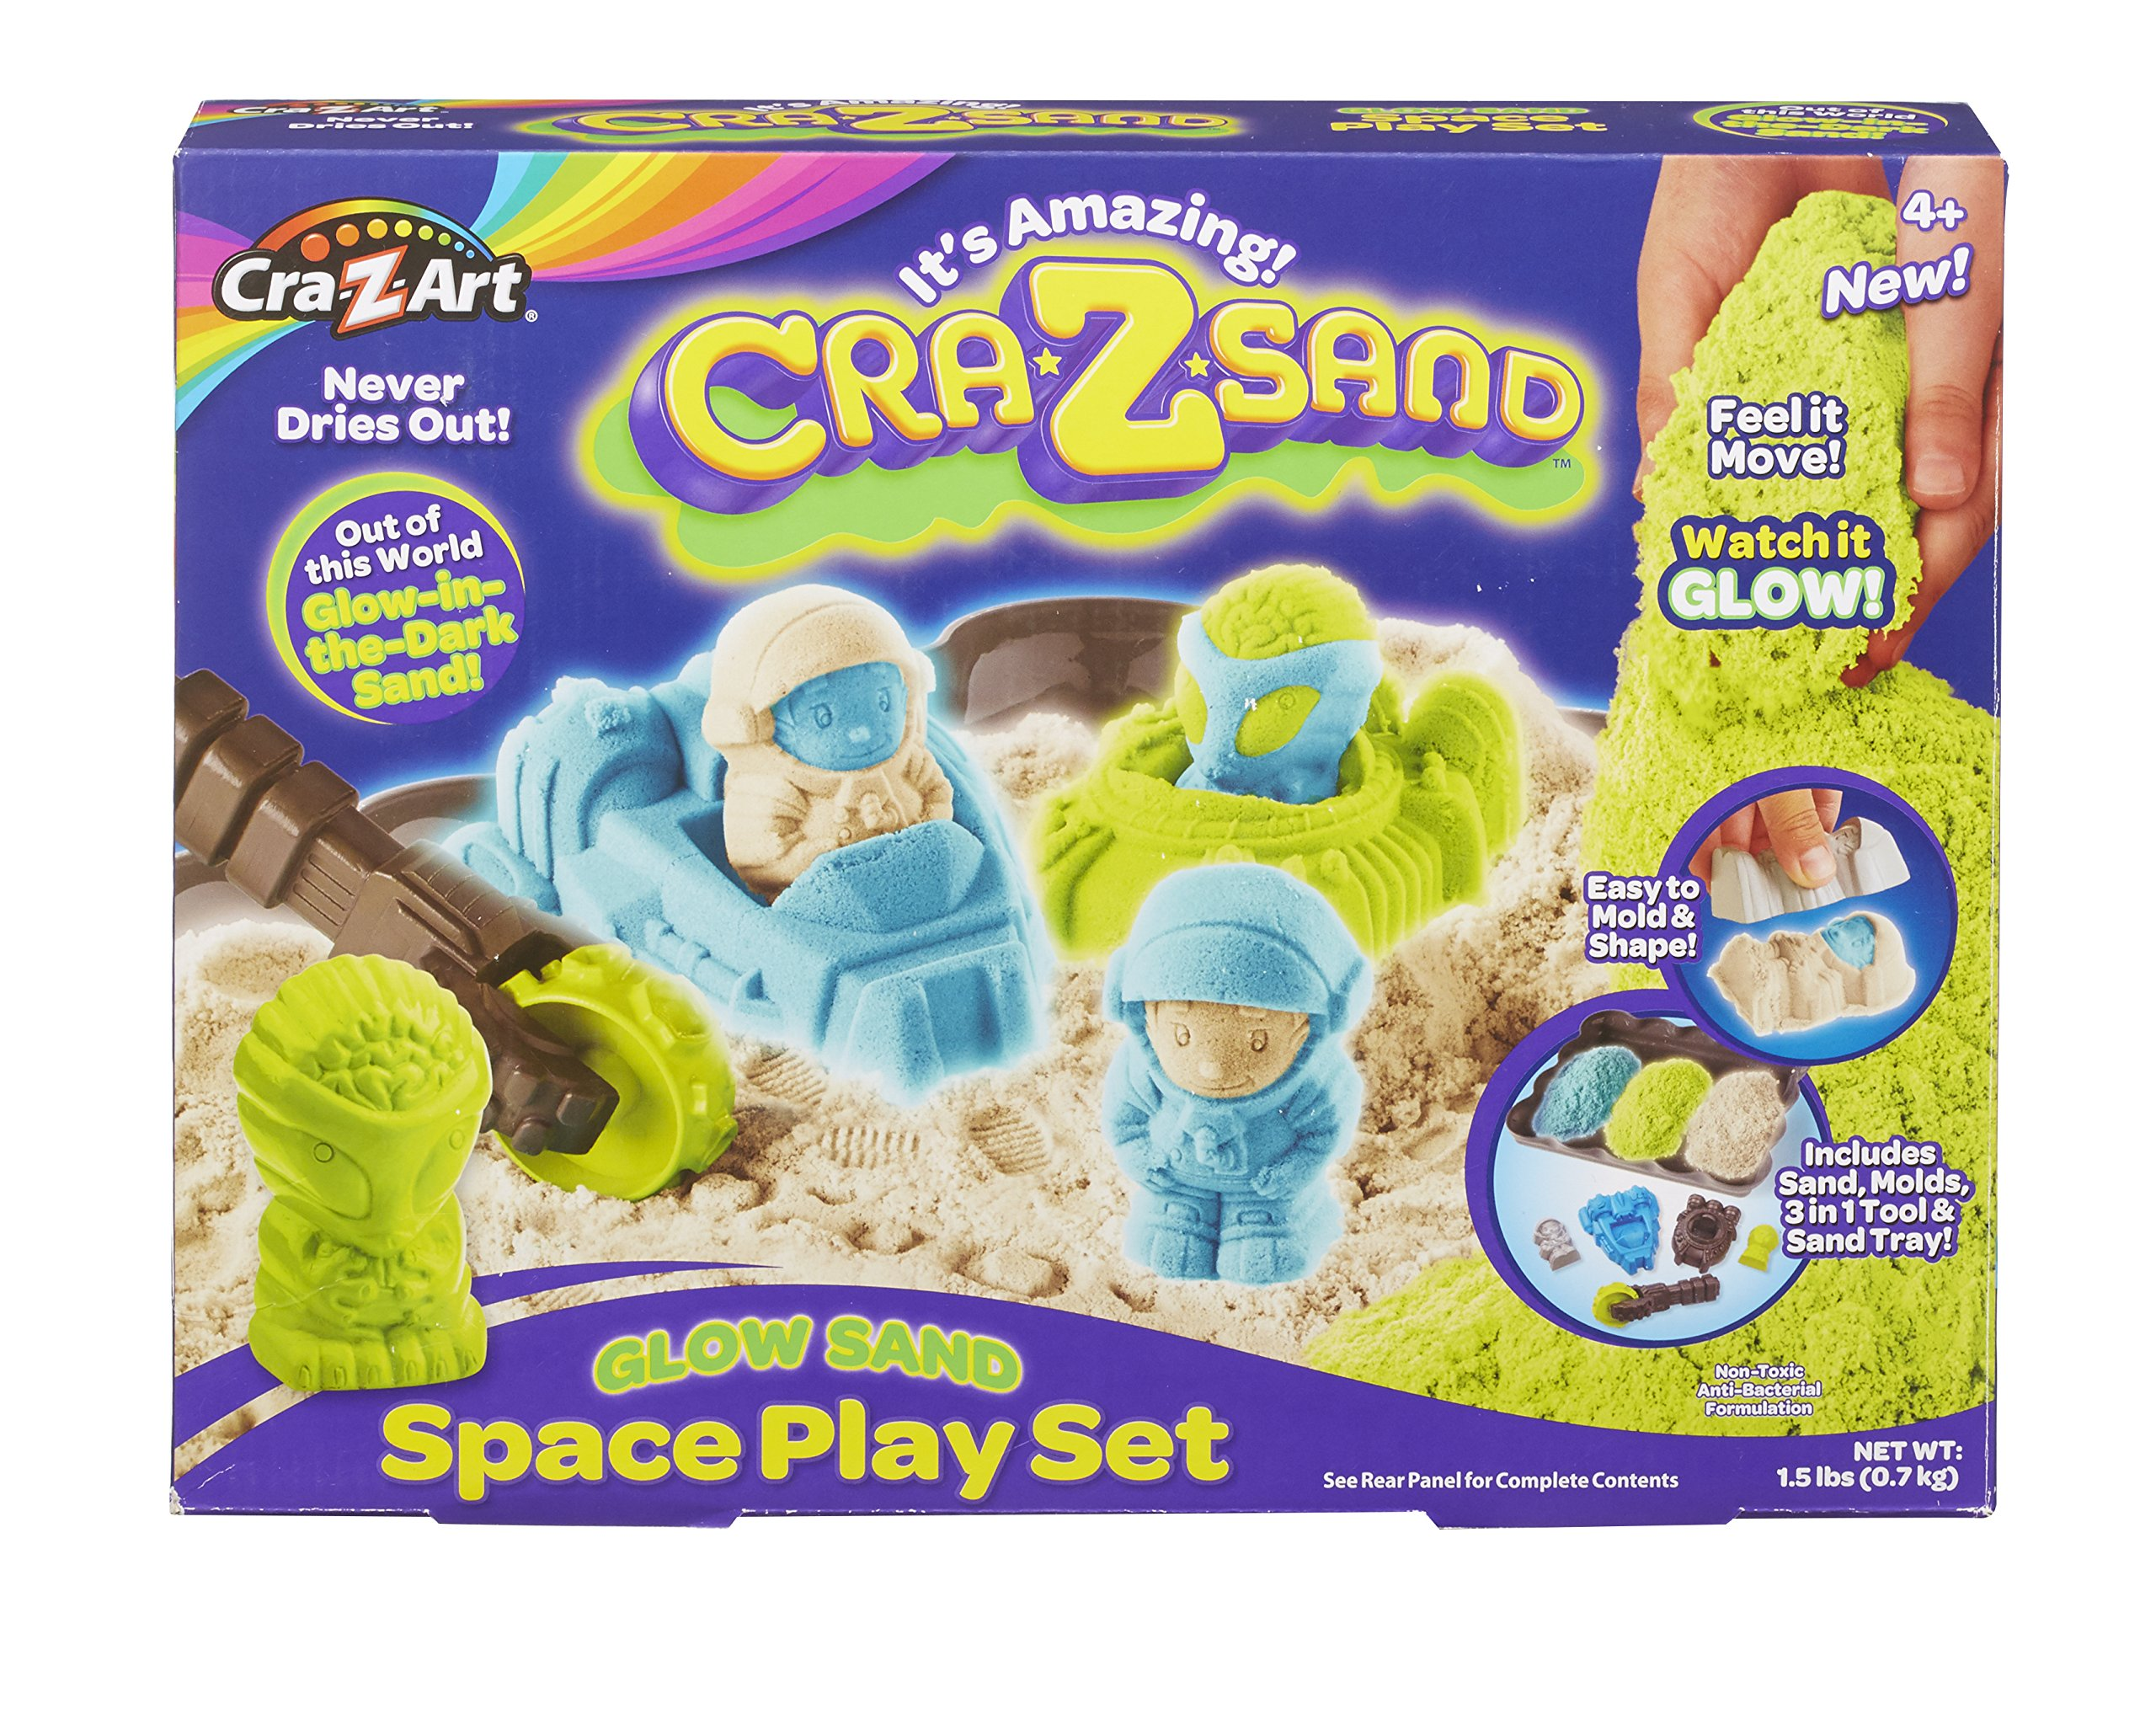 Cra-Z-Art Cra-Z-Sand Glow Sand Space Set Toy by Cra-Z-Art (Image #5)